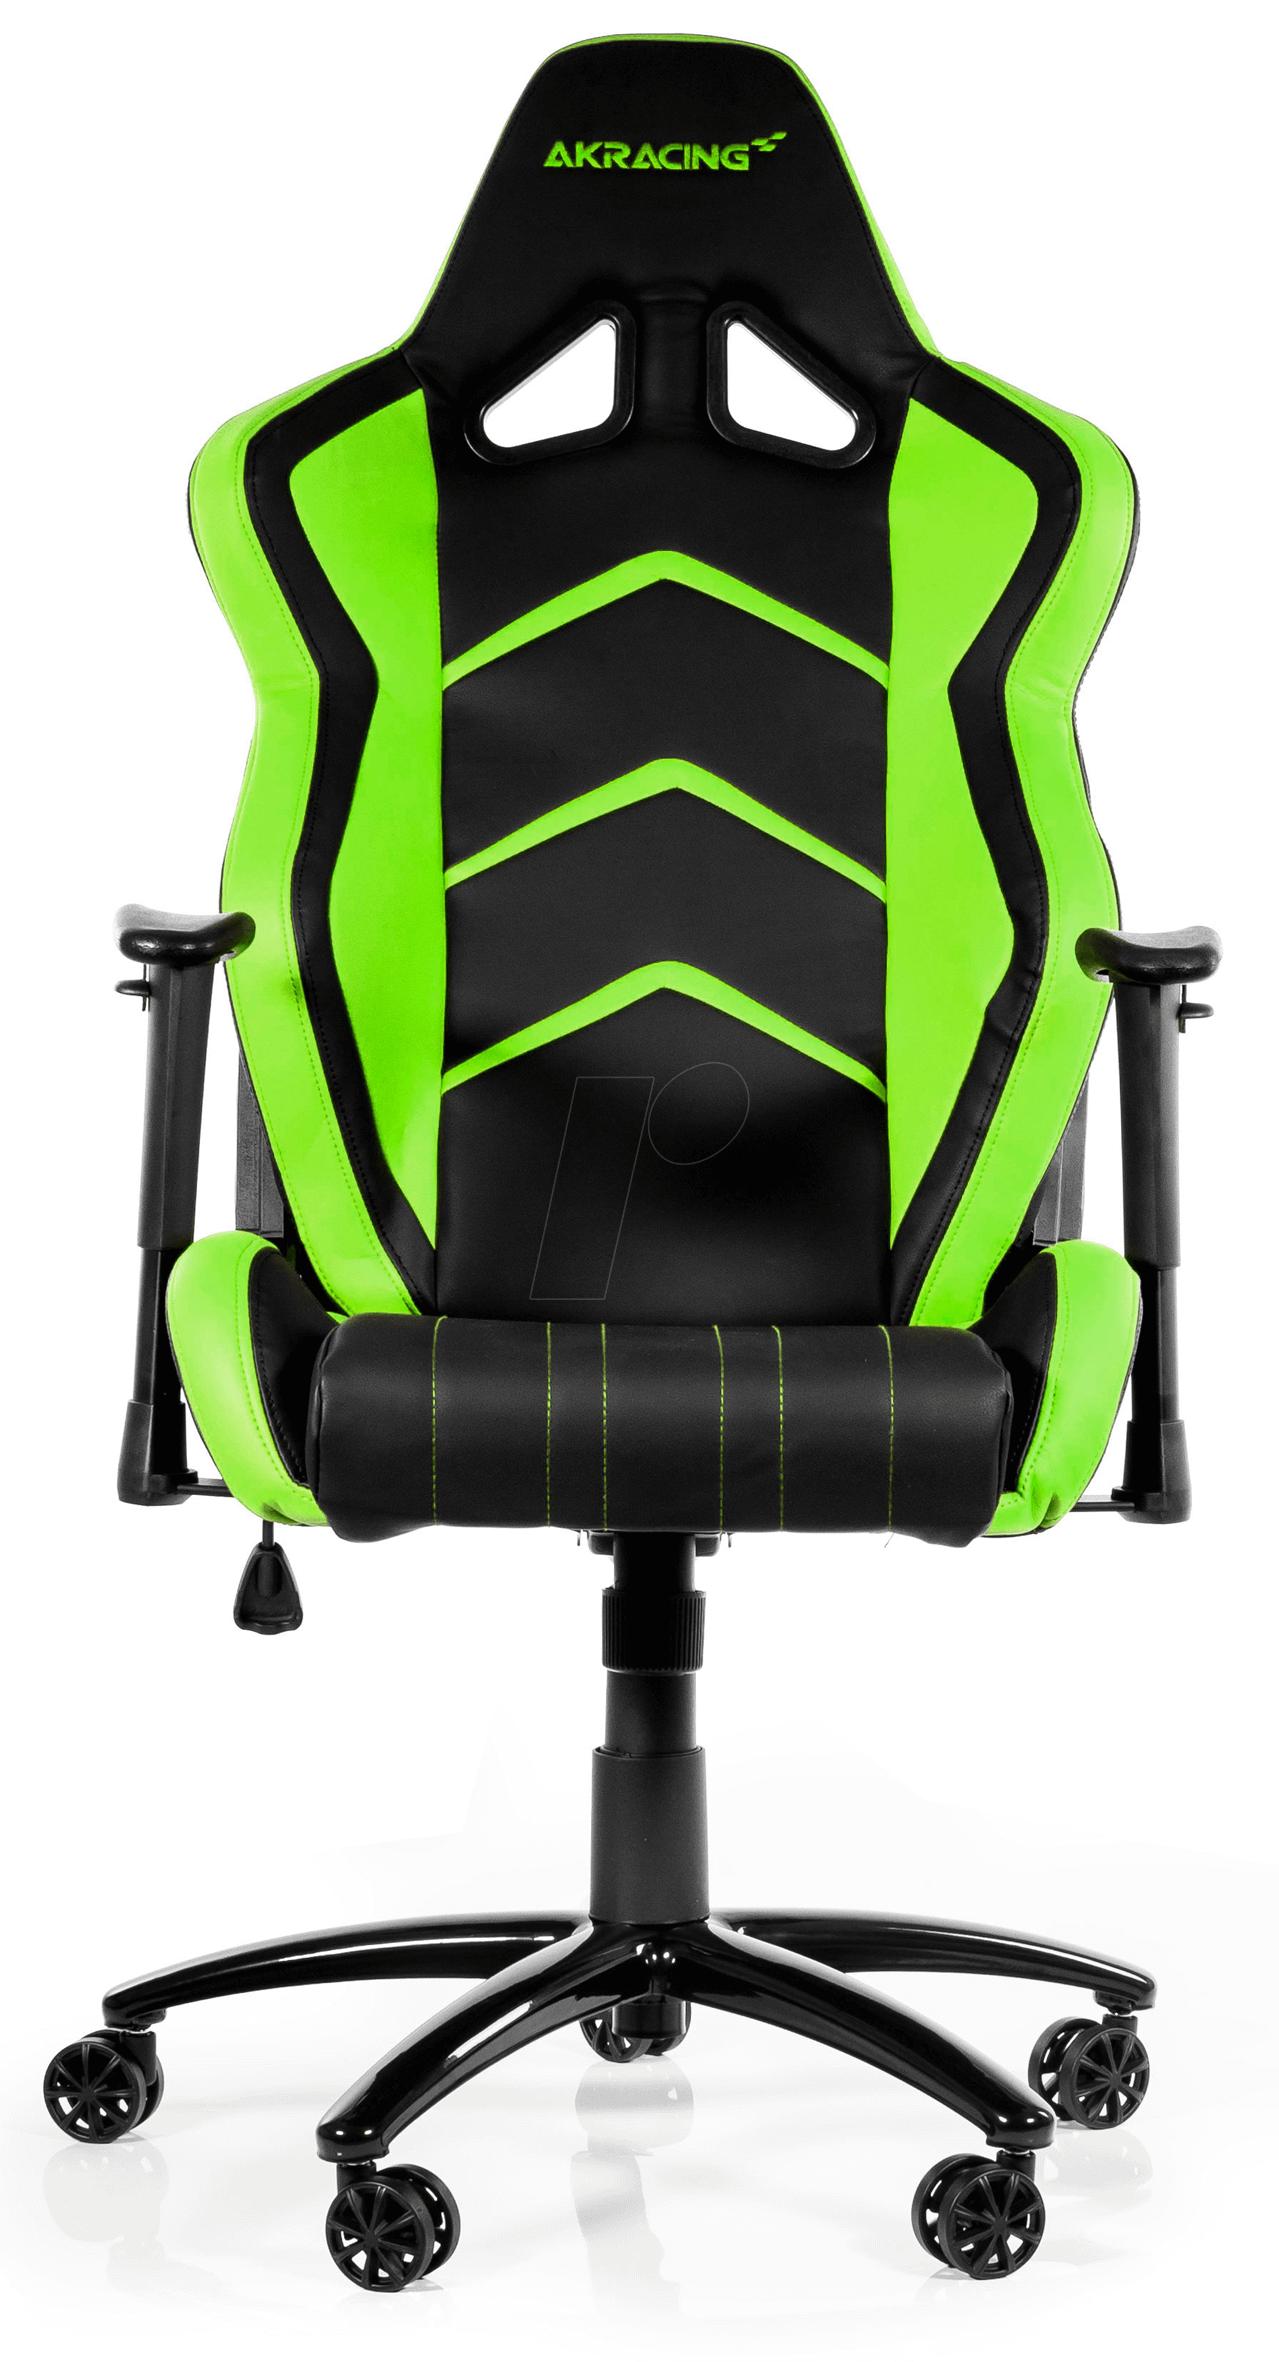 AK K6014 BG Gaming Stuhl AKRACING Player schwarz grün